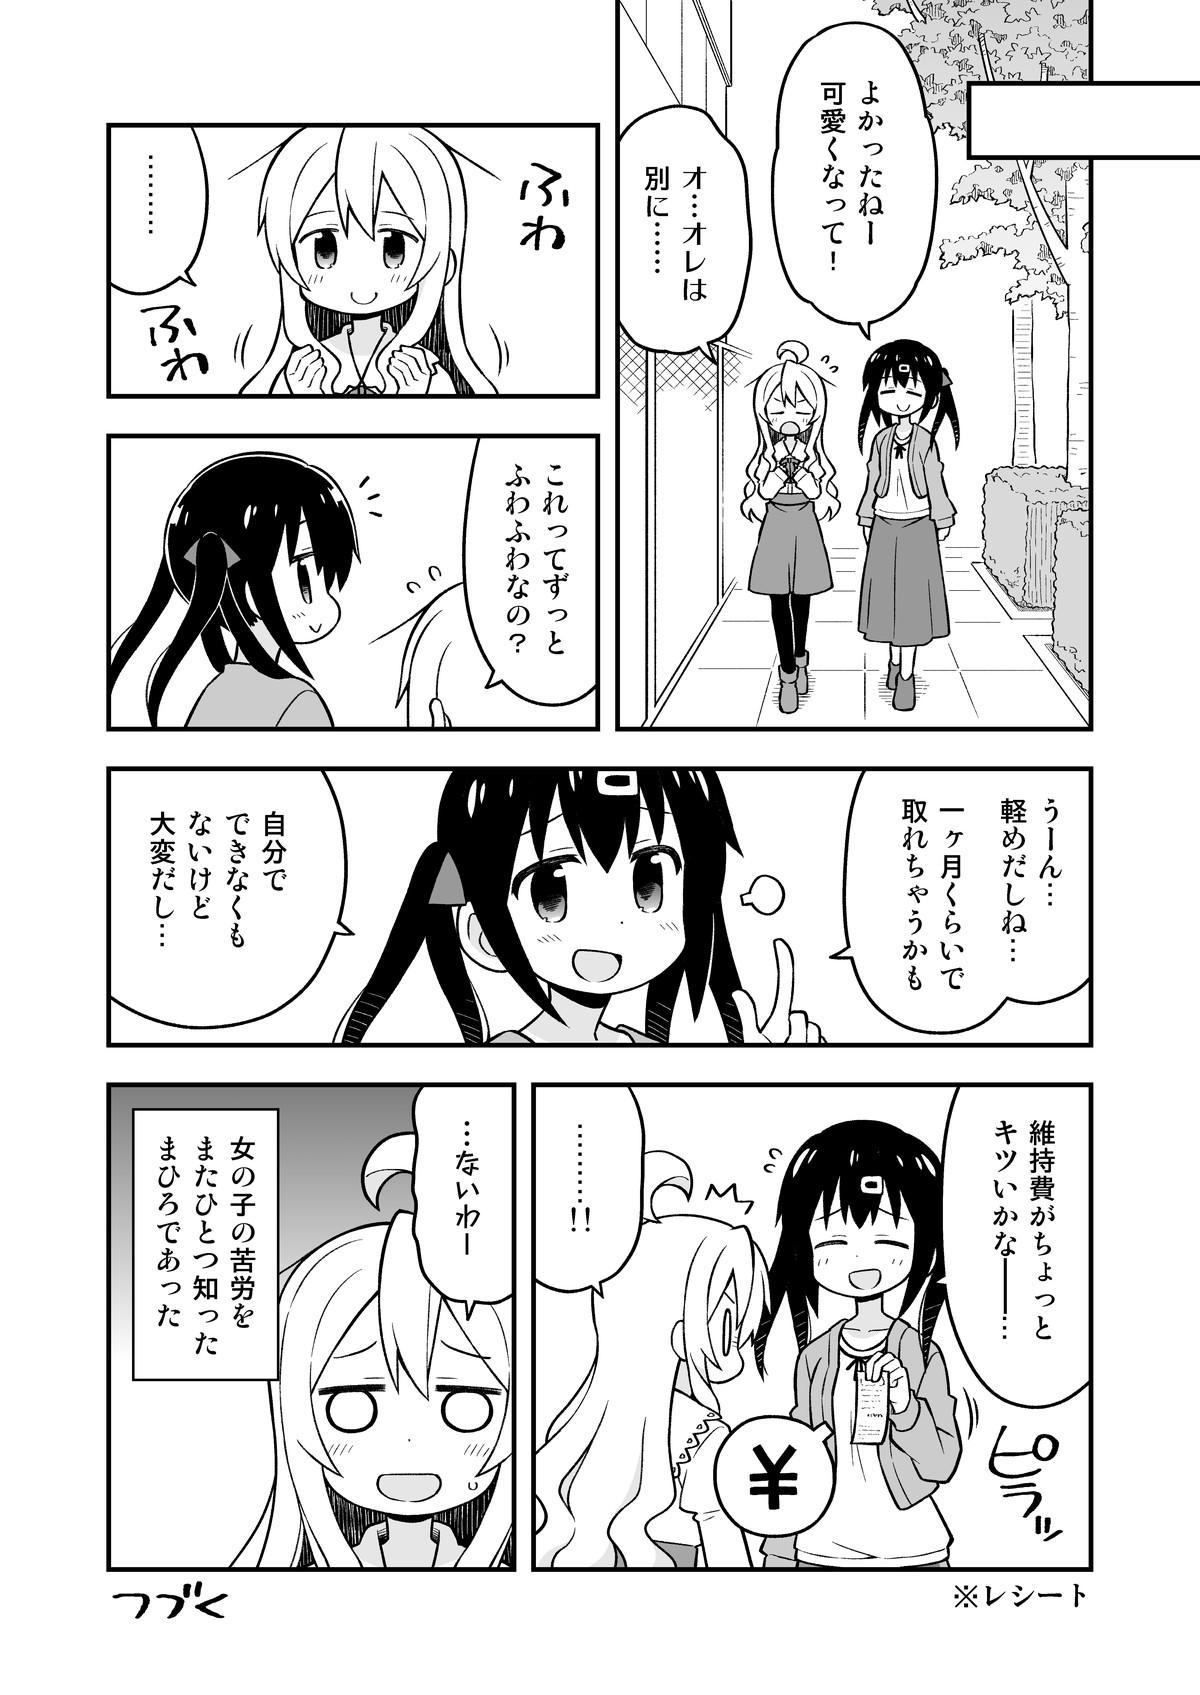 Onii-chan wa Oshimai! 6 10